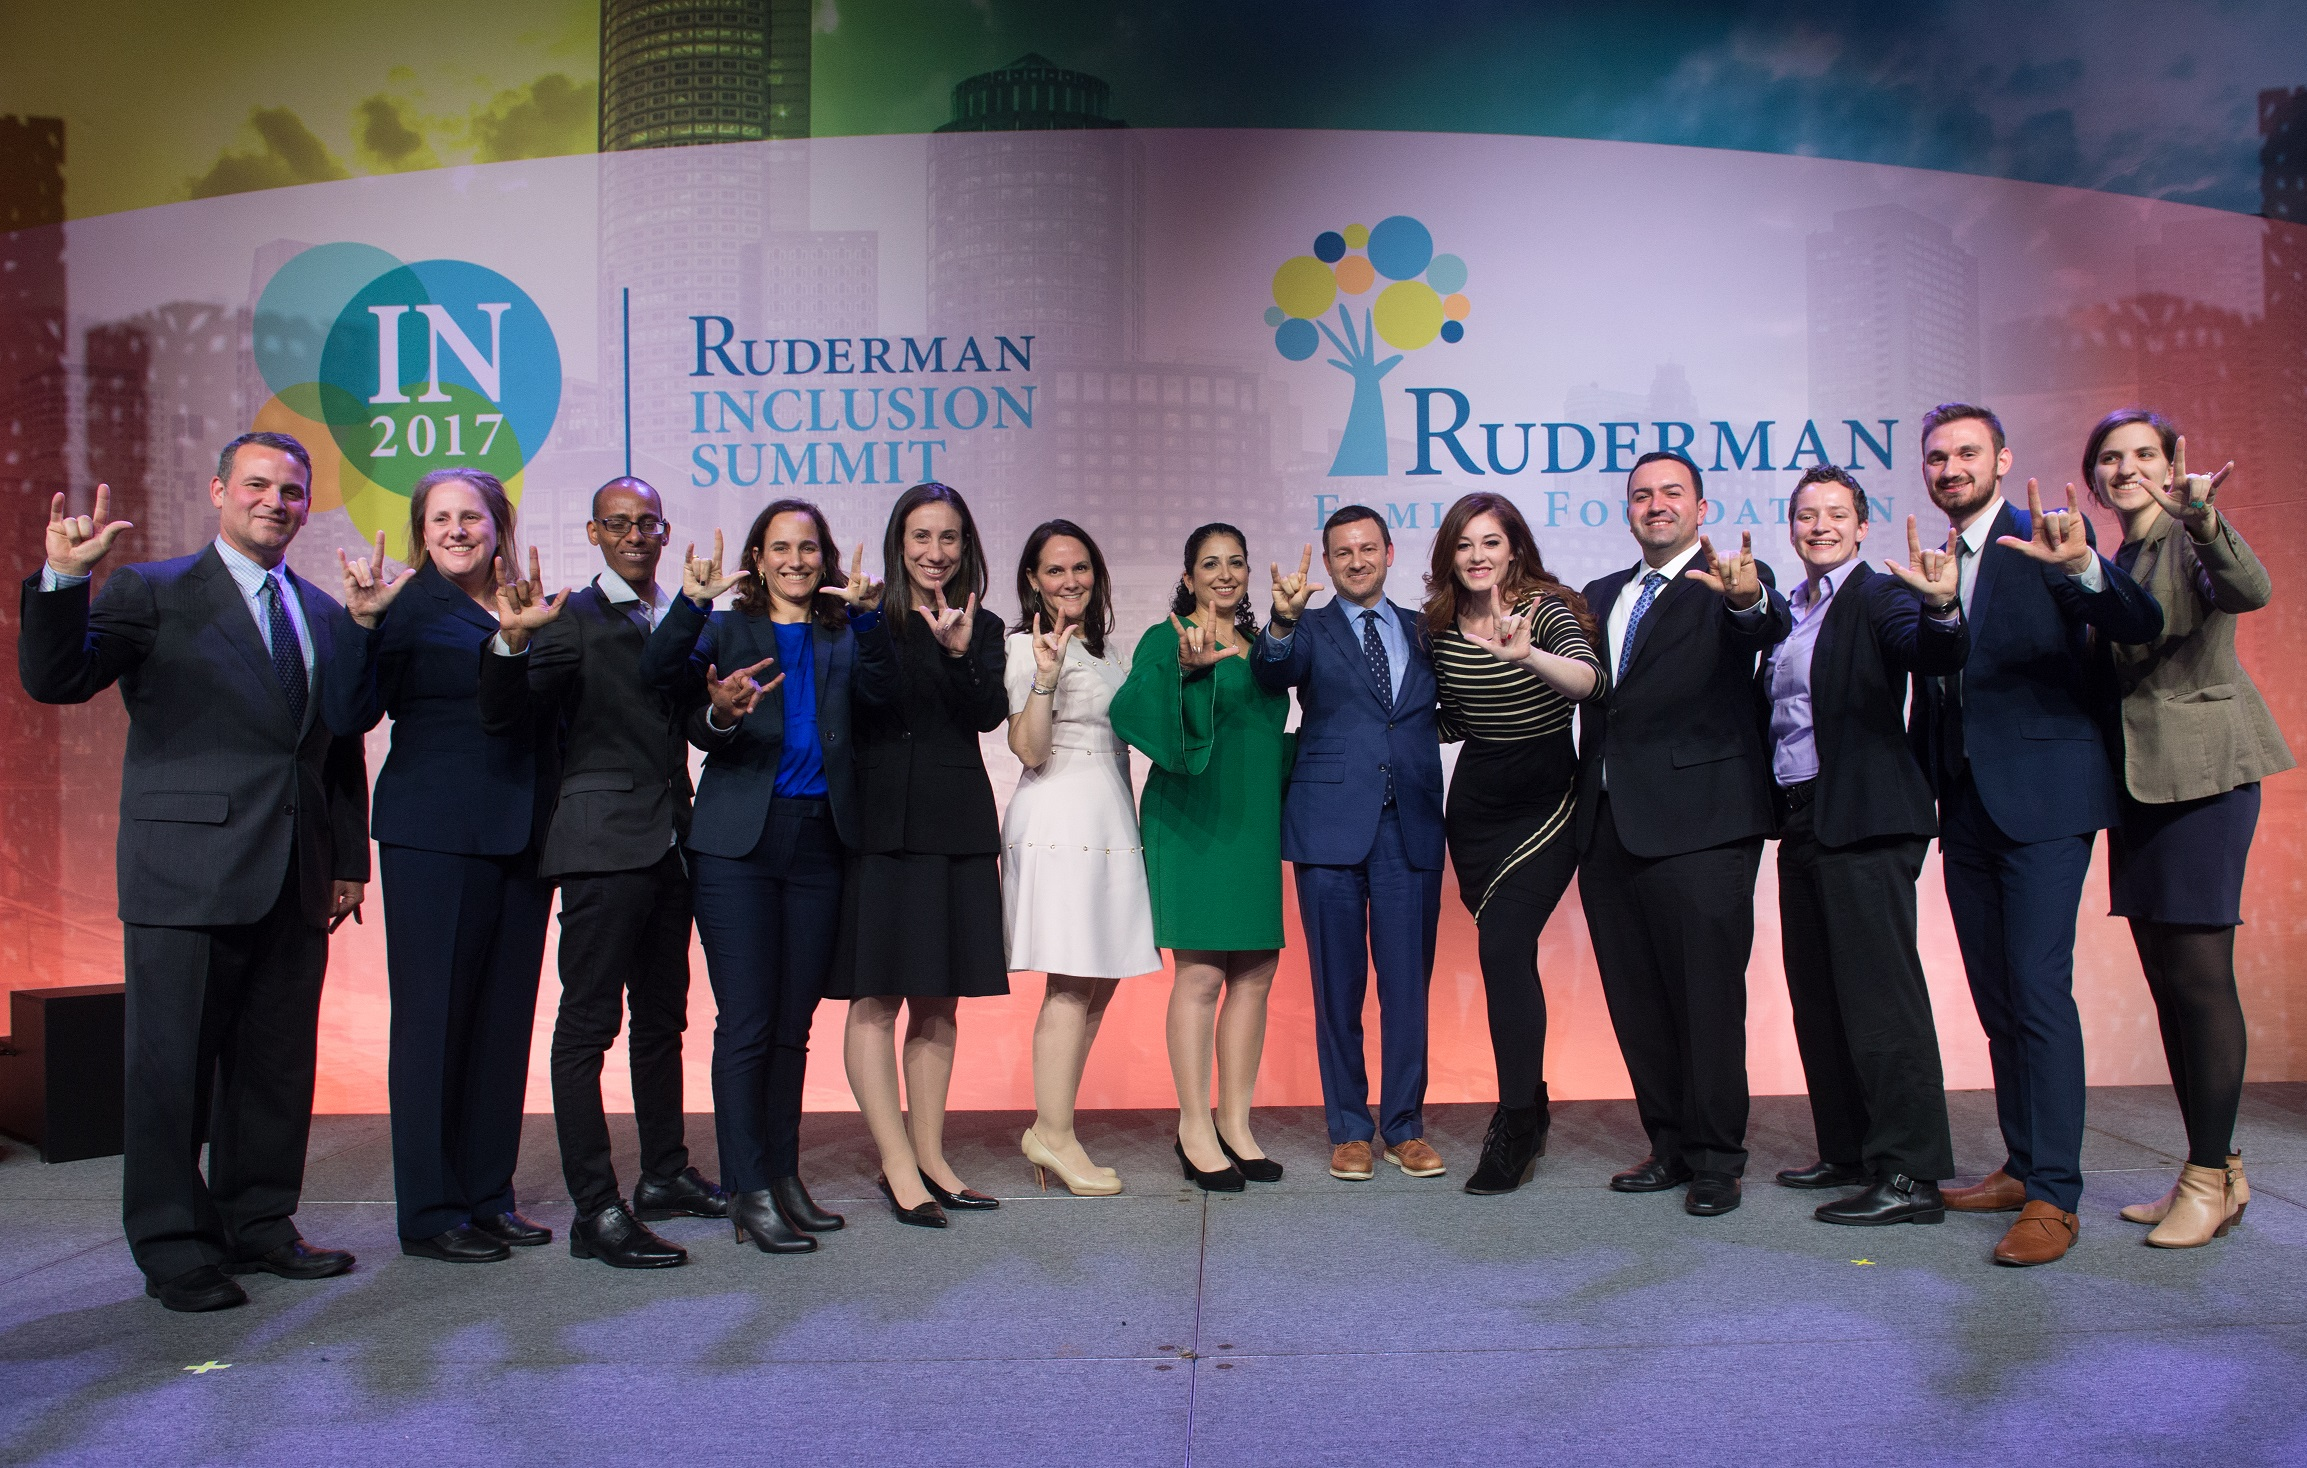 2017 Ruderman Inclusion Summit Highlights